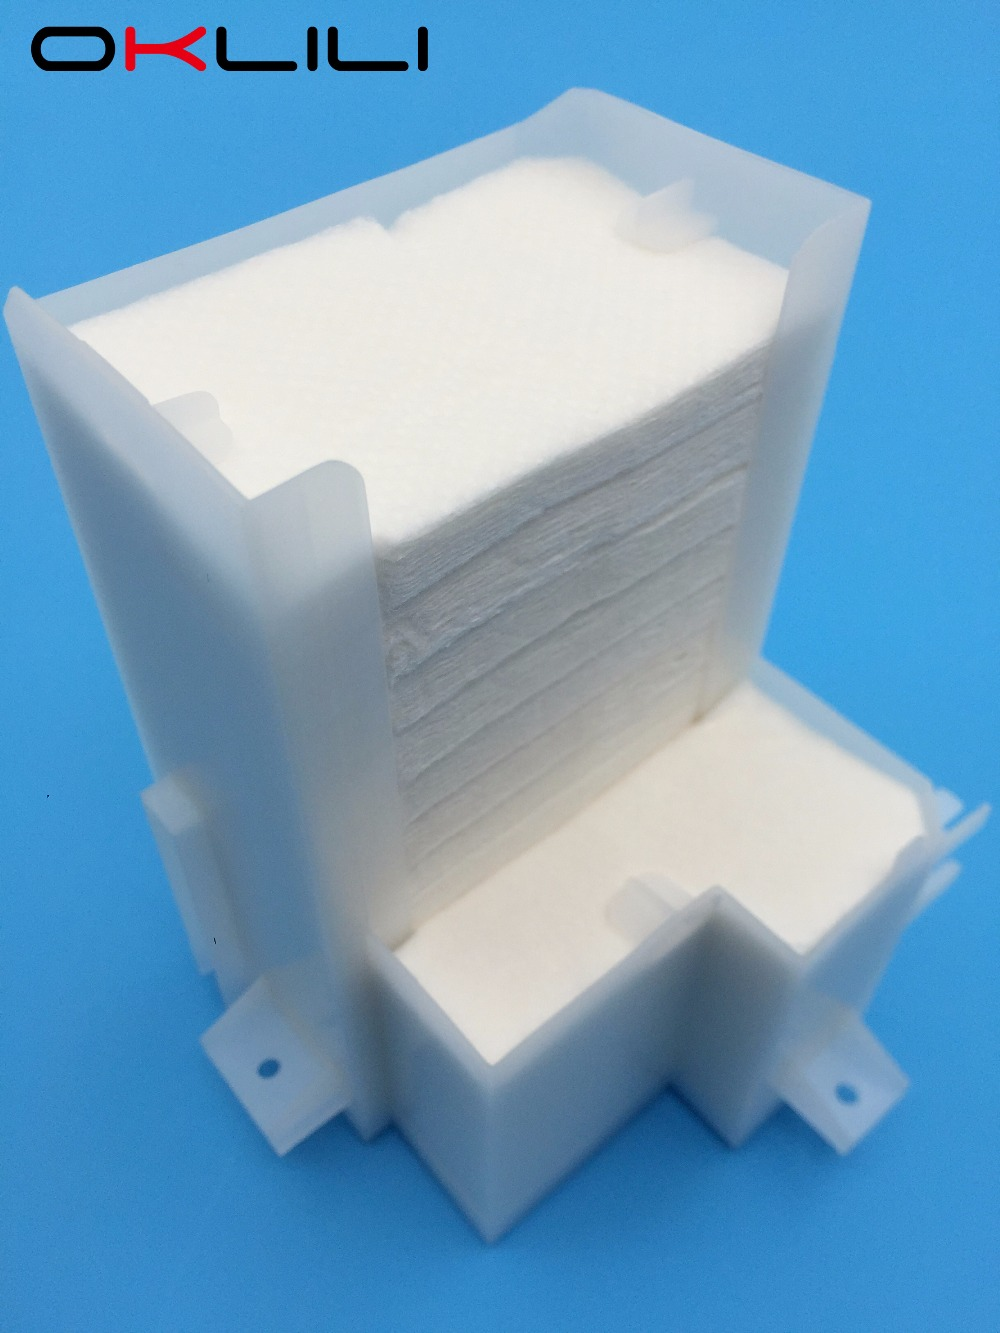 ORIGINAL NEW Waste Ink Tank Pad Sponge for Epson R280 R290 RX600 RX610 RX690 PX650 P50 P60 T50 T60 A50 L800 L801 R330 R390